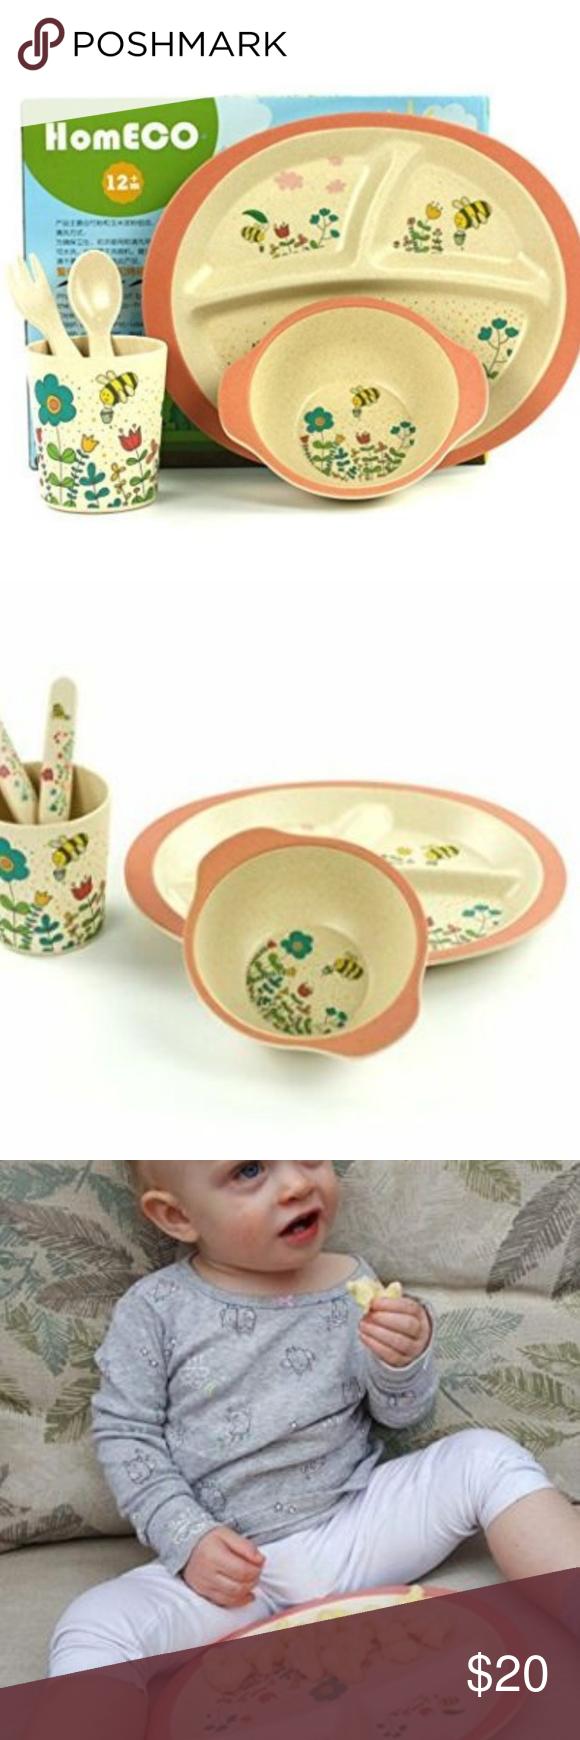 Baby Dinnerware Set Bamboo Fiber Bowl Plate Cup Fork Spoon Flower Bee Kids